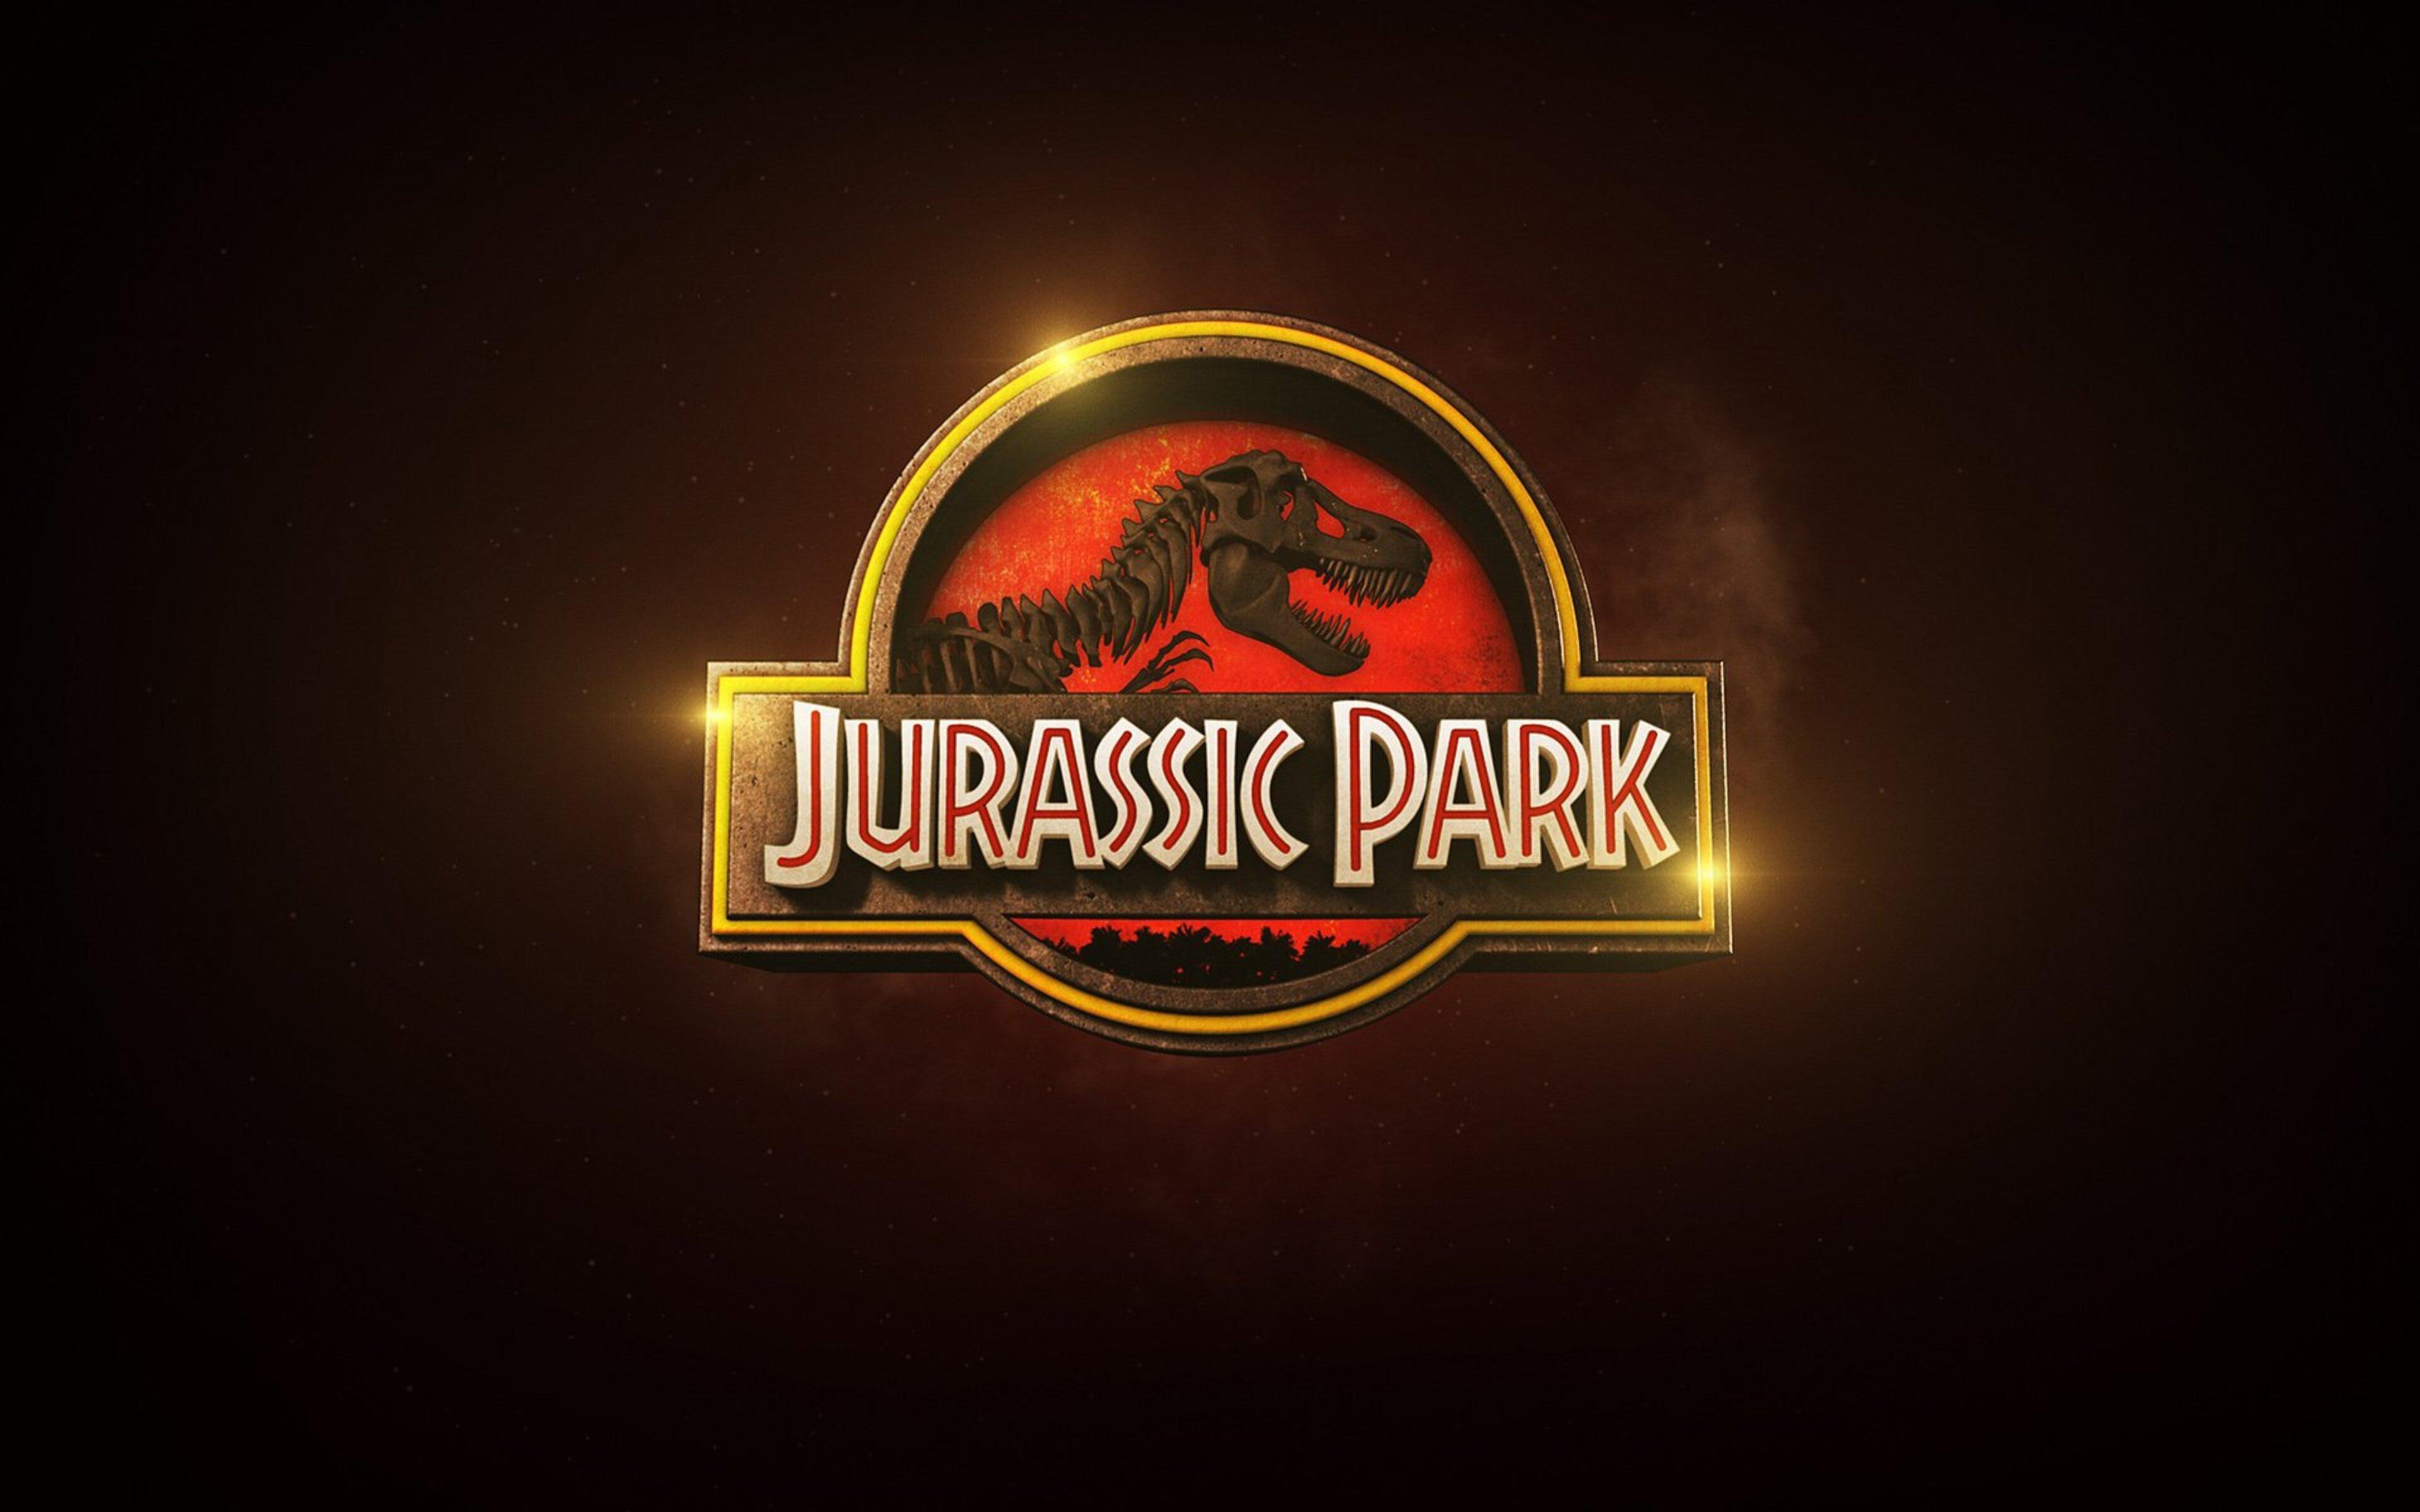 jurassic park logo - HD1920×1200